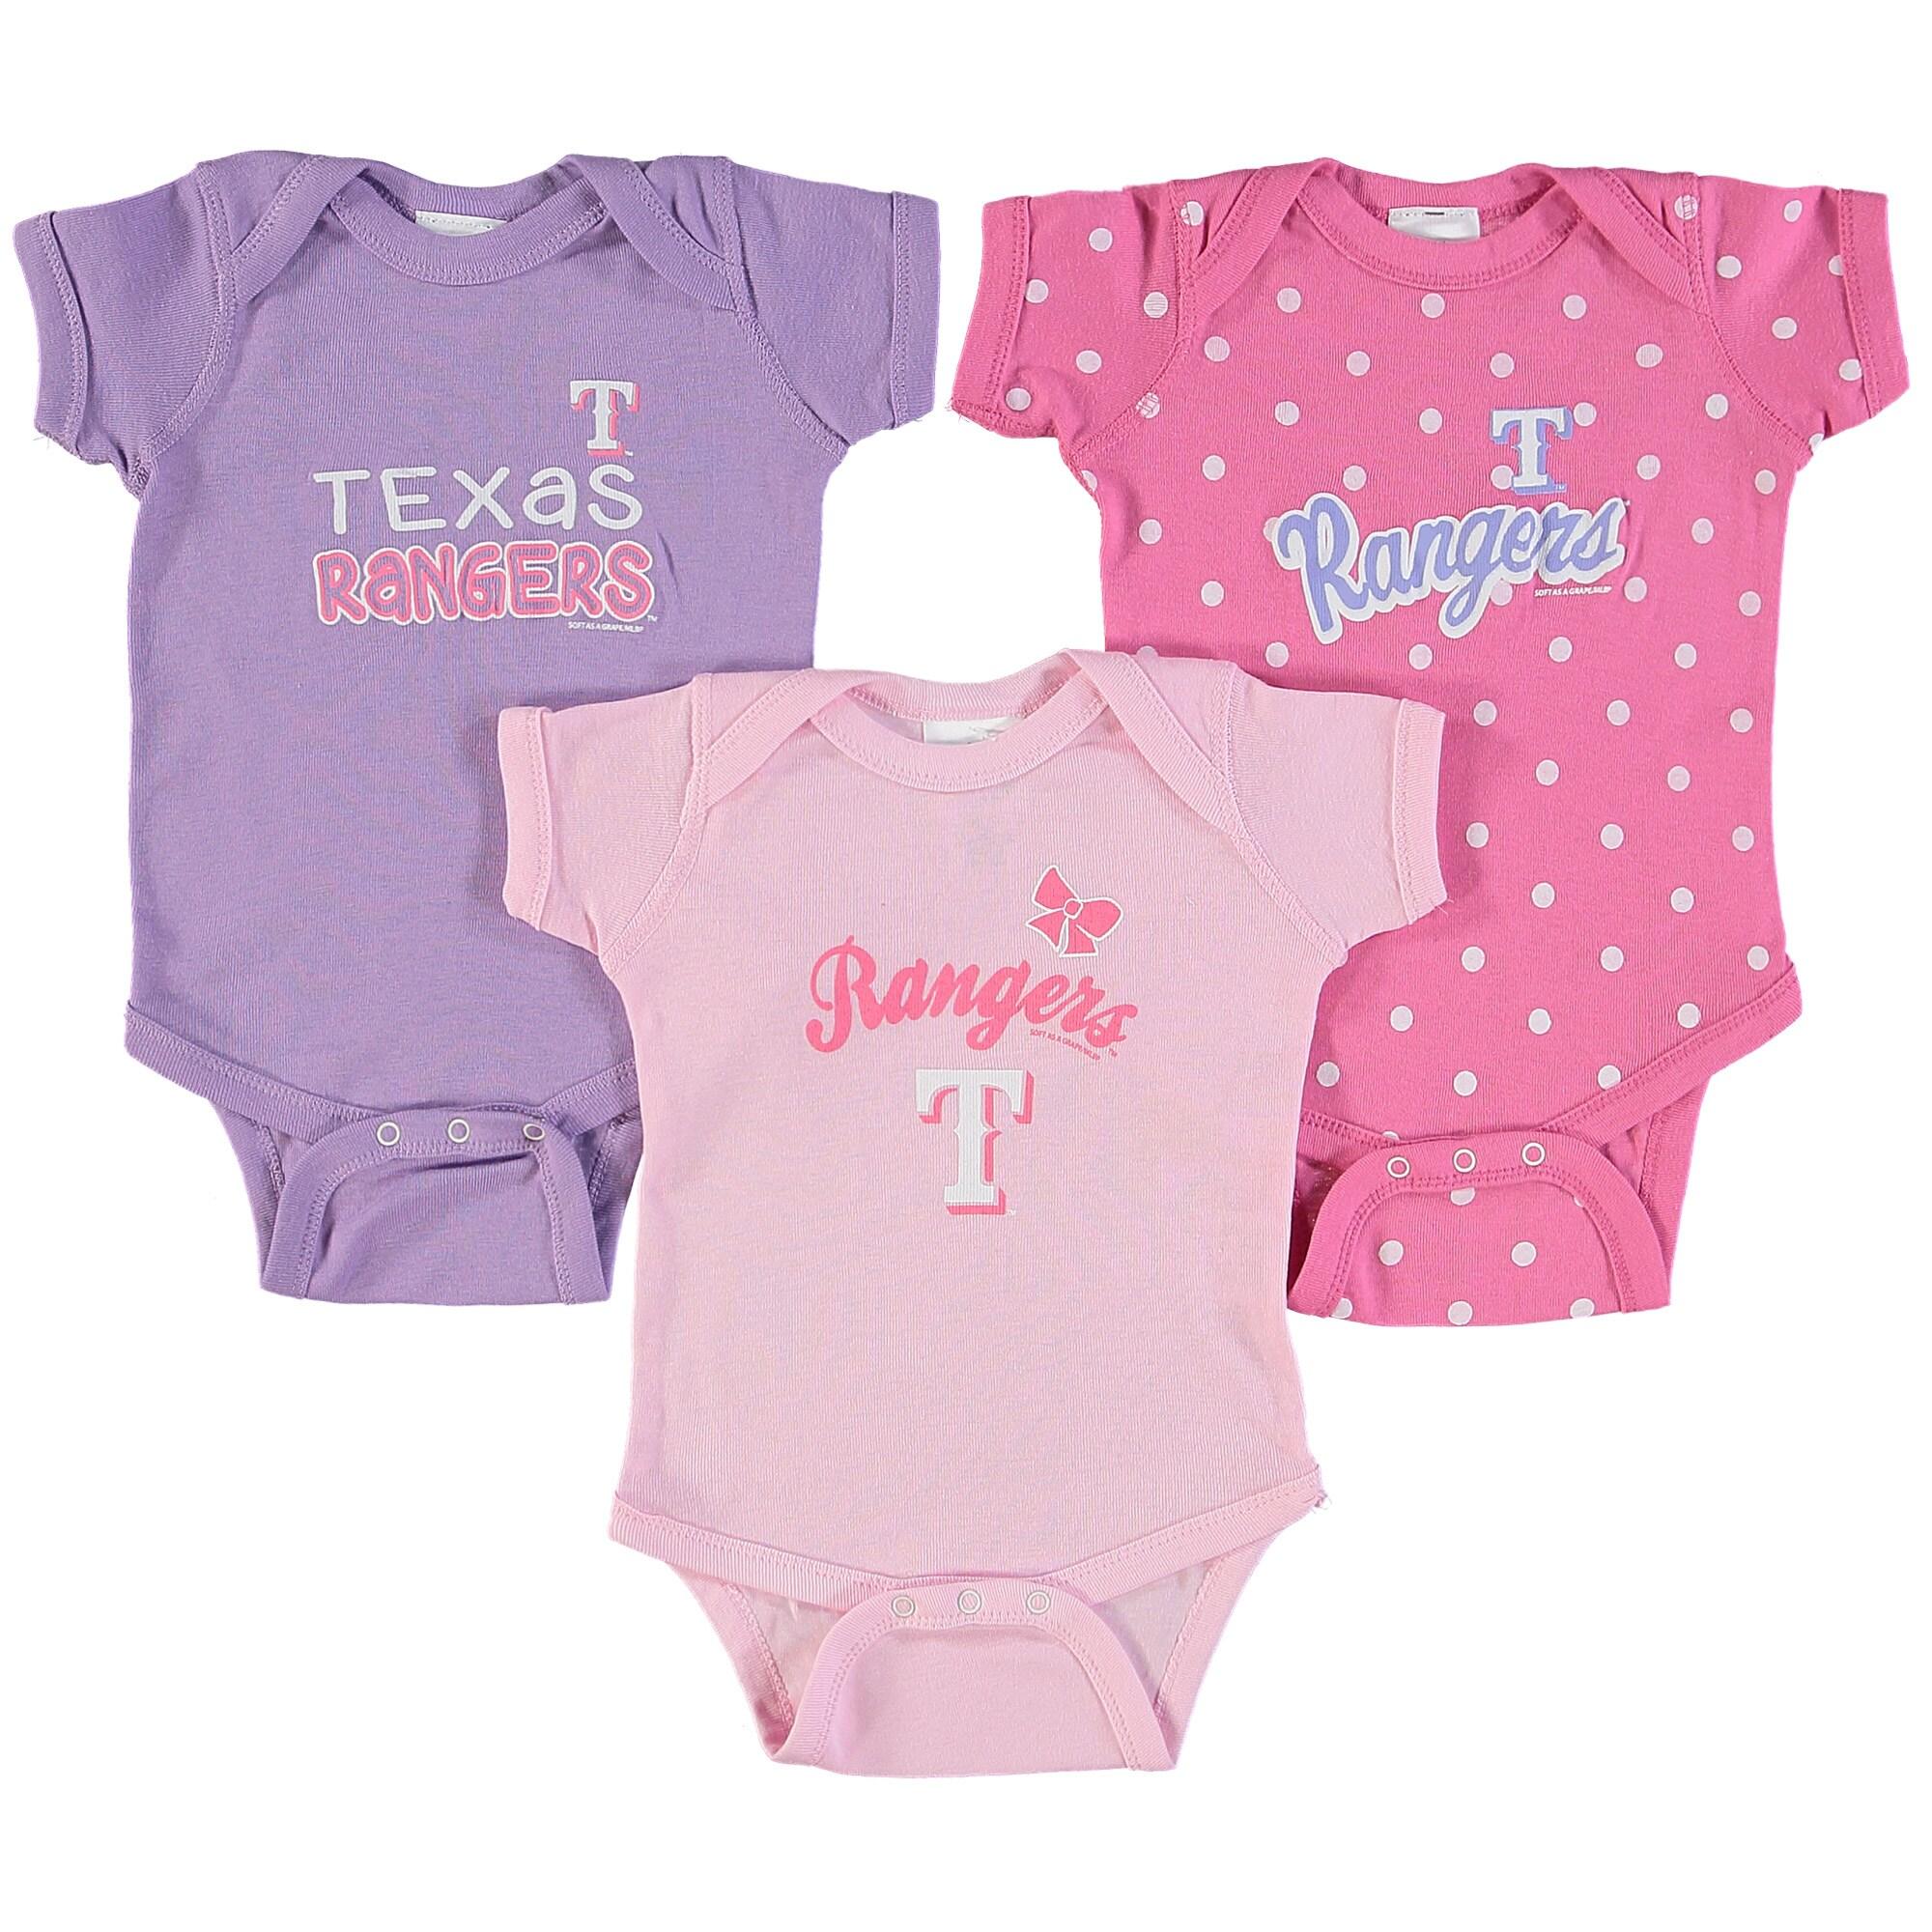 Texas Rangers Soft as a Grape Girls Infant 3-Pack Rookie Bodysuit Set - Pink/Purple